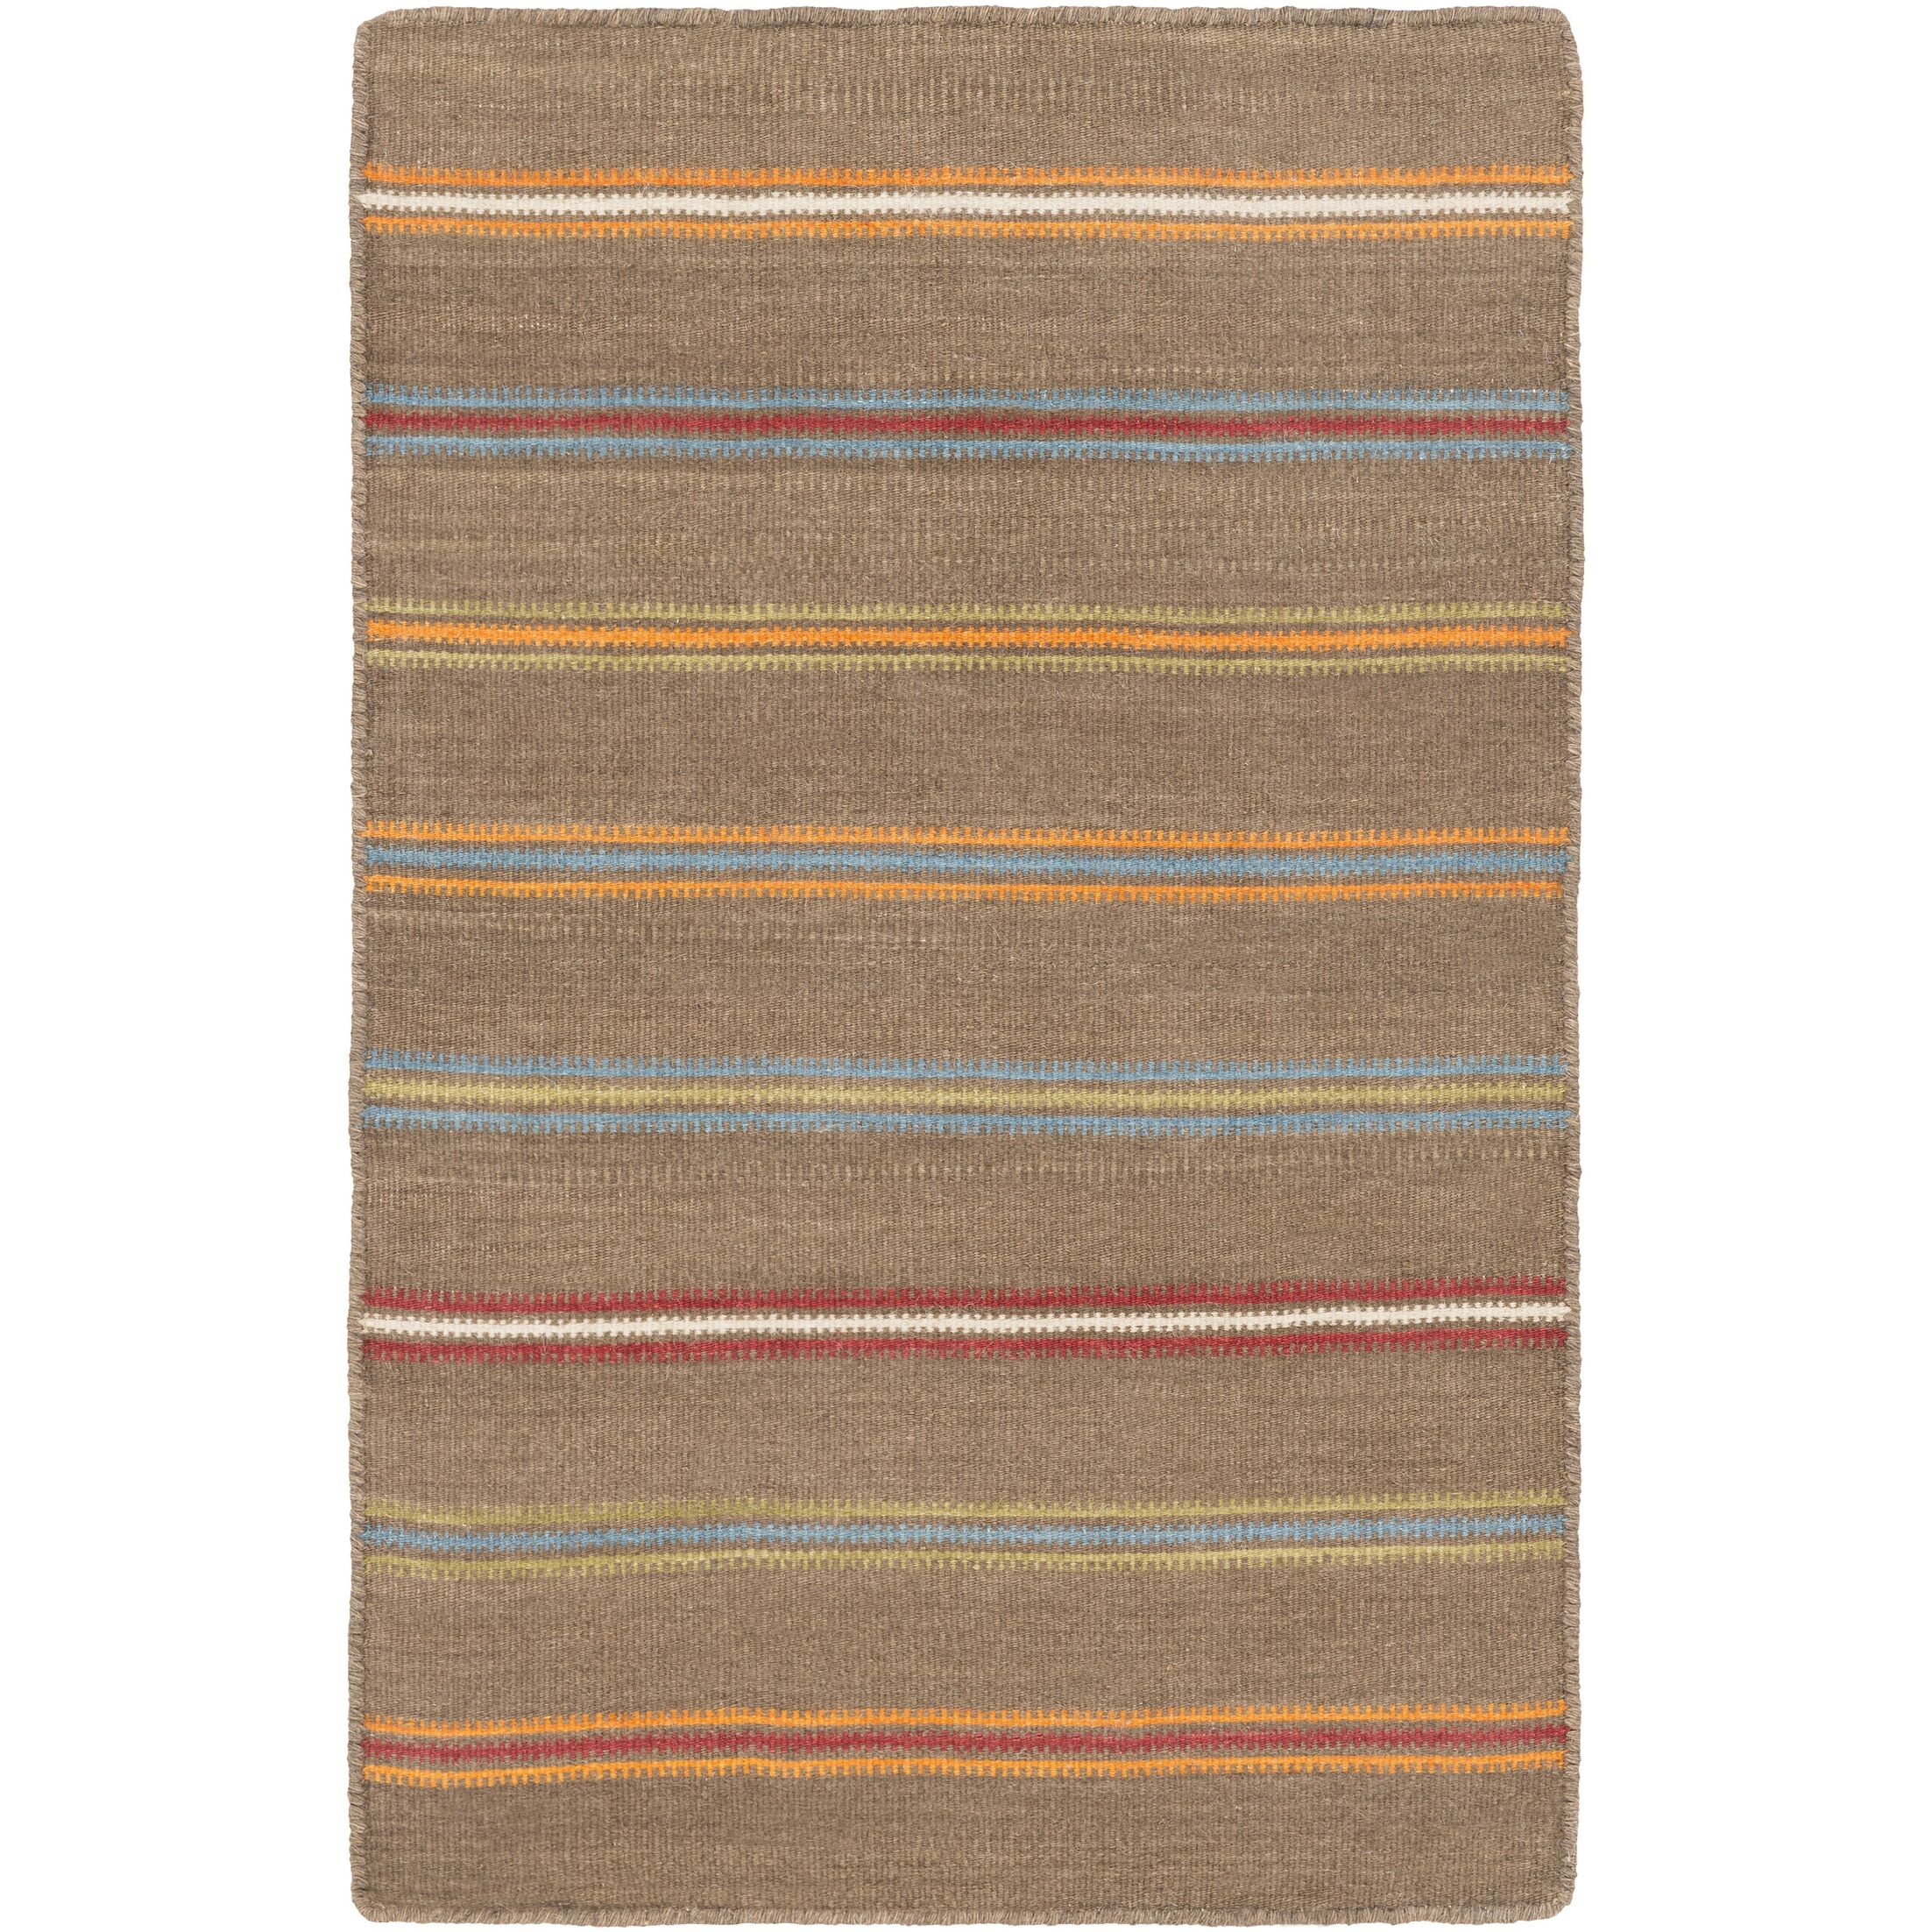 Nashville Hand-WovenBrown Area Rug Rug Size: Rectangle 4' x 6'